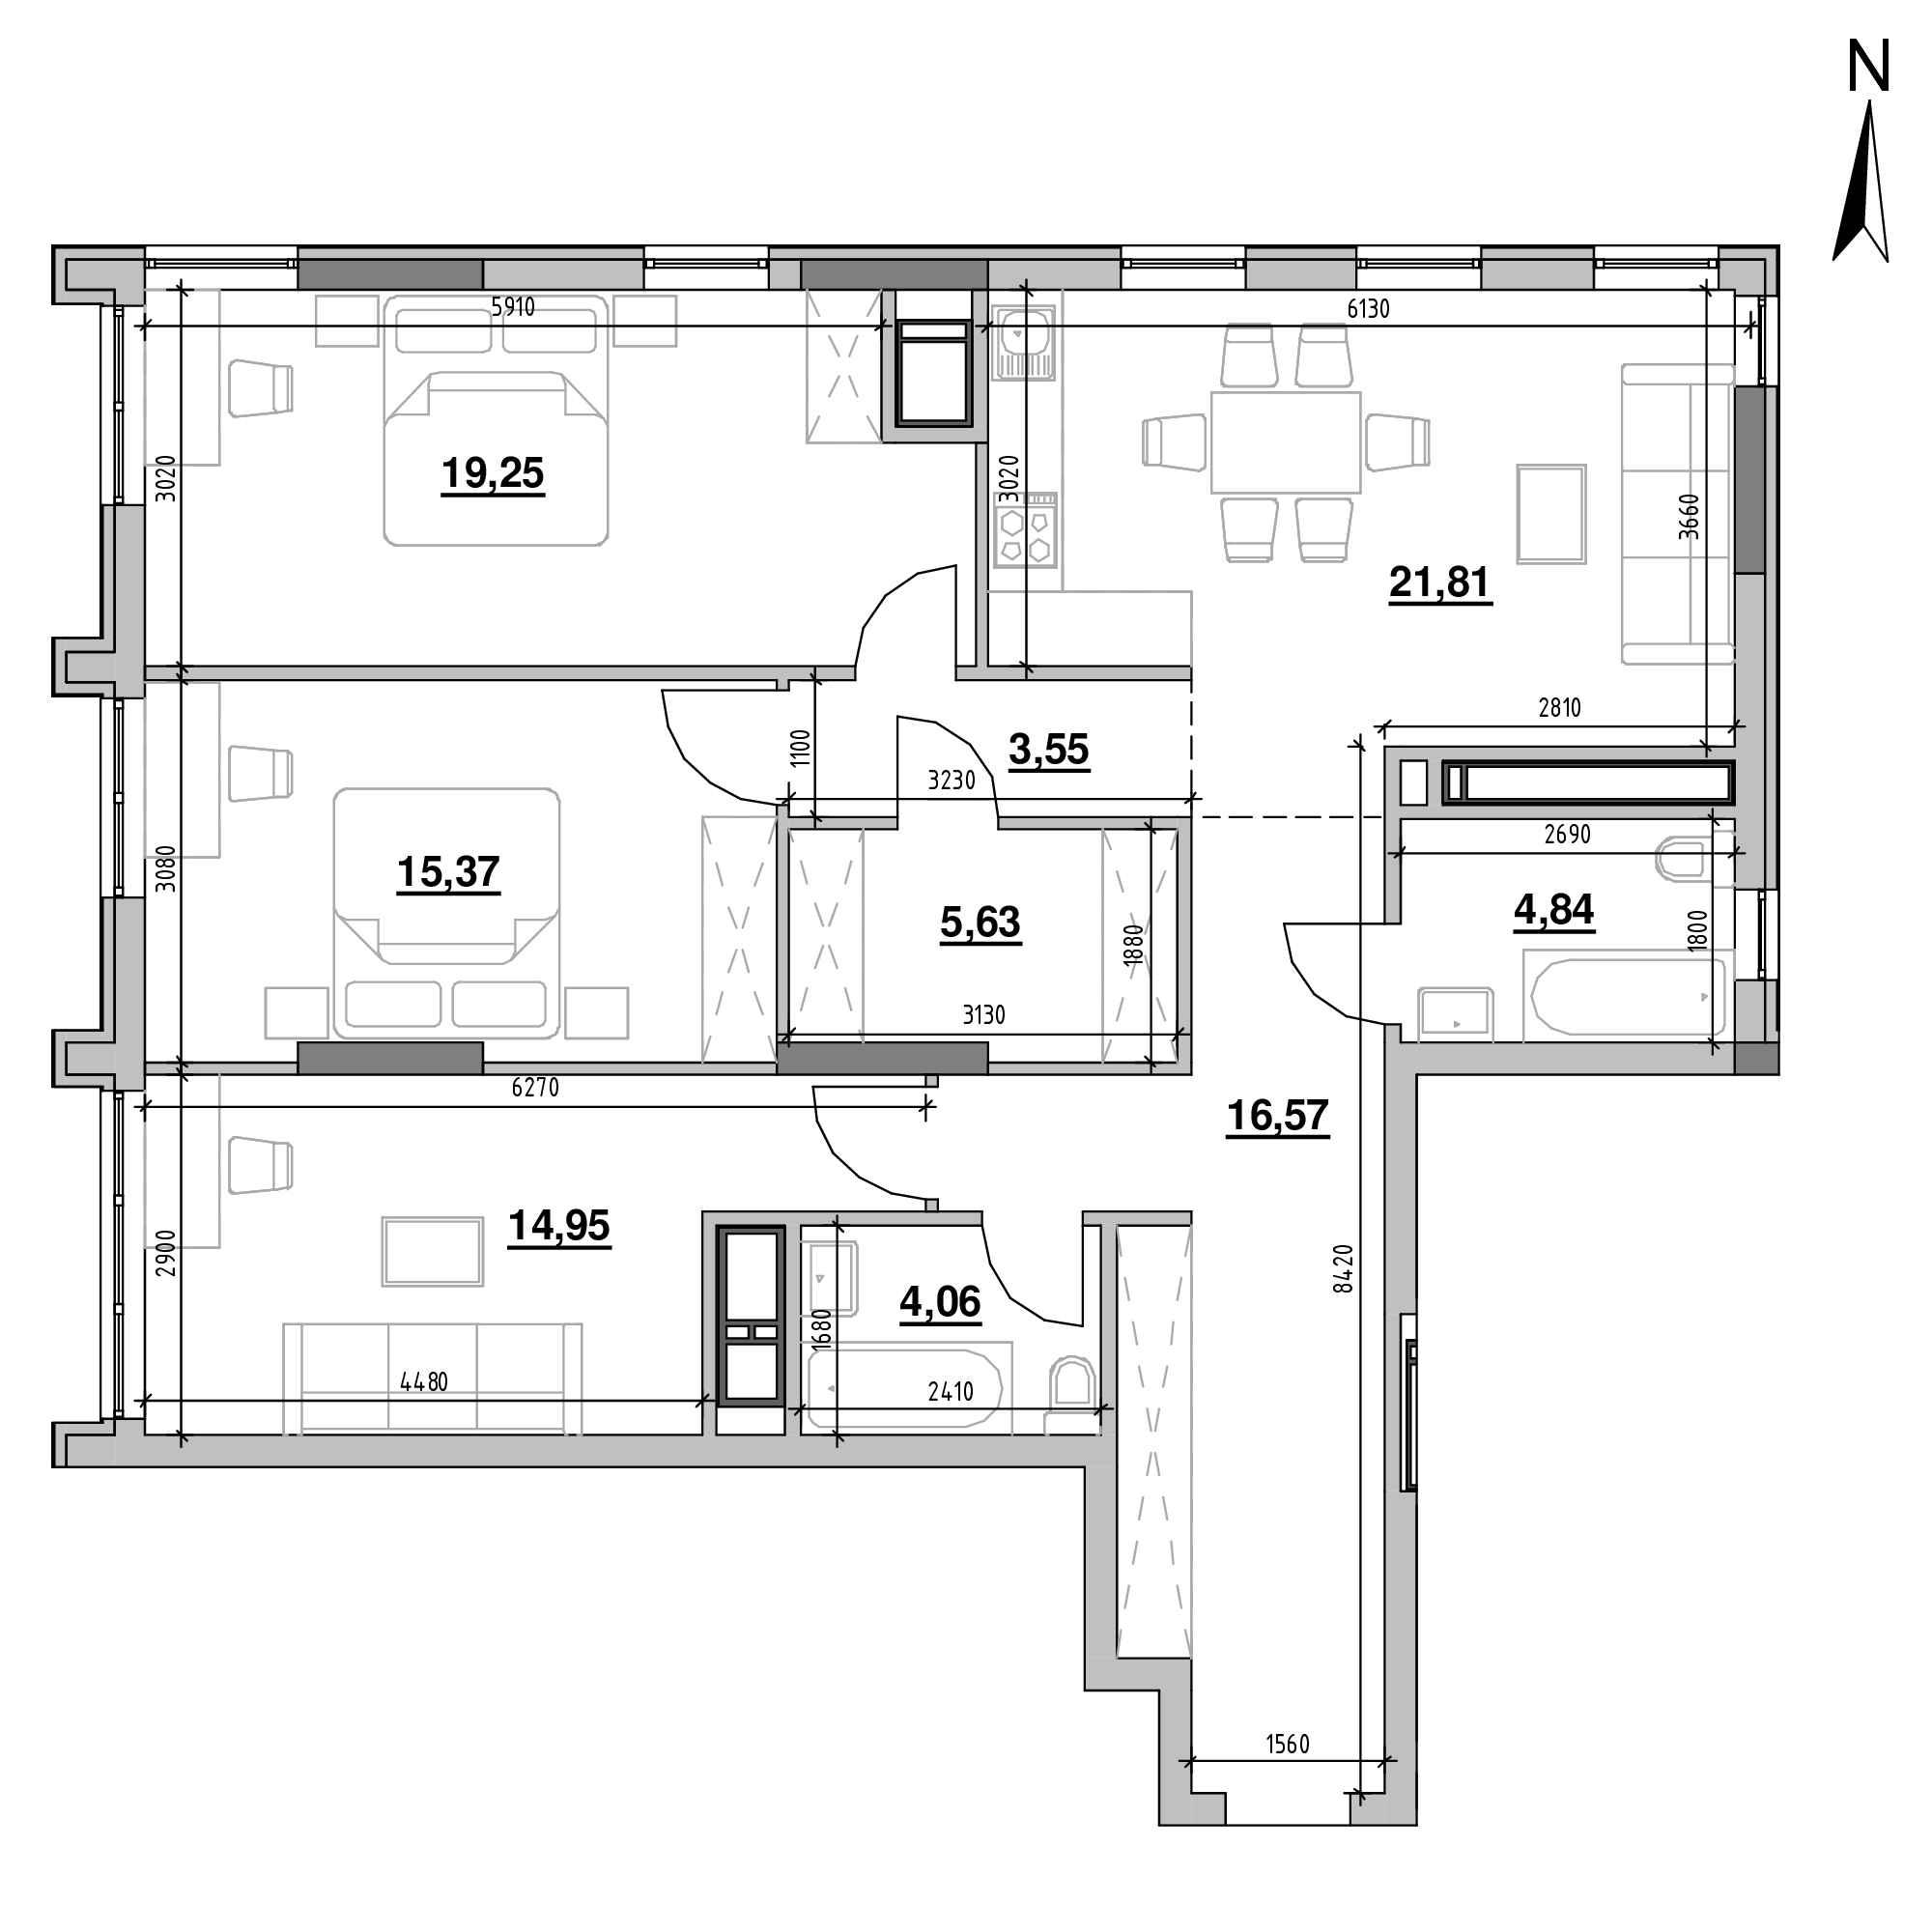 ЖК Nordica Residence: планування 1-кімнатної квартири, №142, 40.97 м<sup>2</sup>